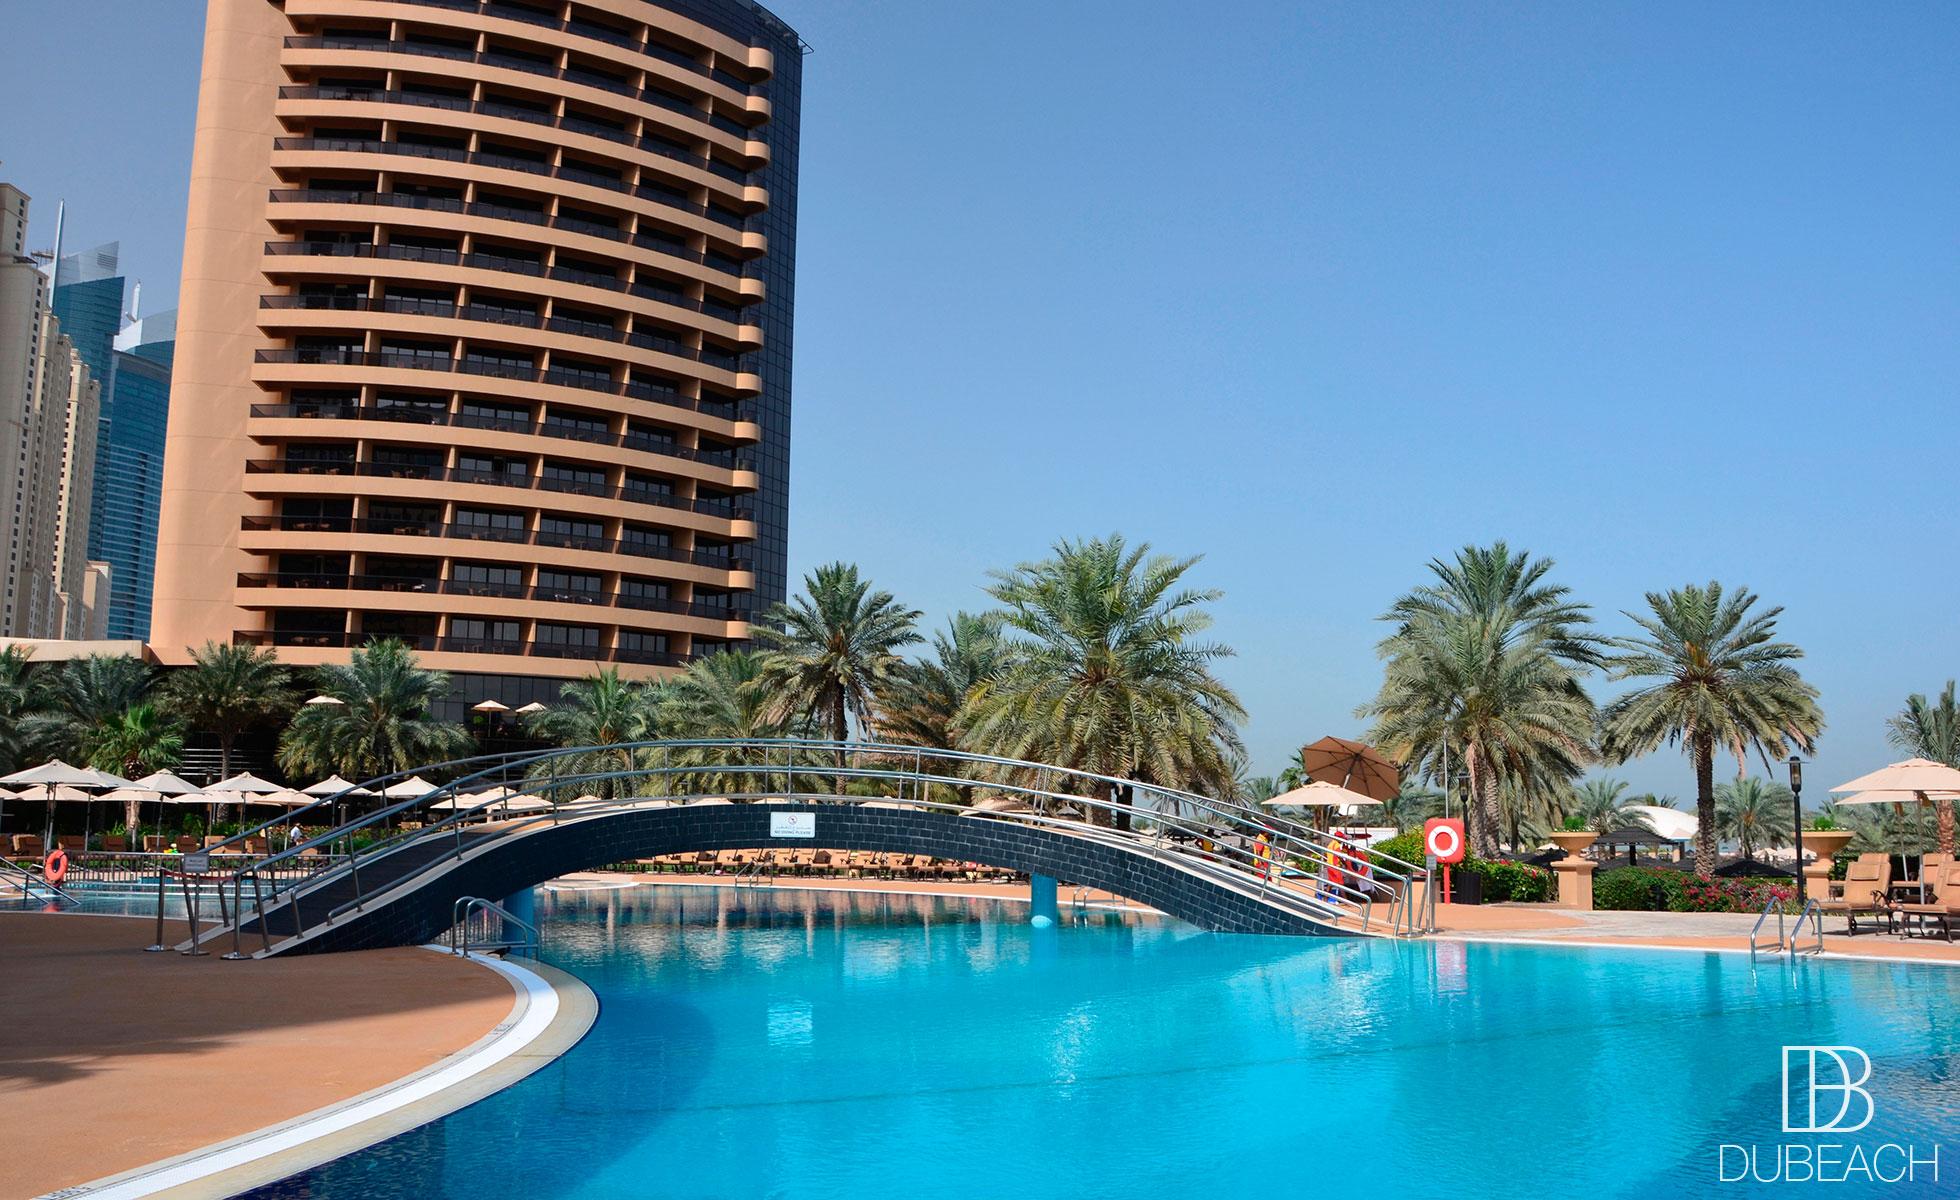 Dubai Hotel Royal Meridien Beach Resort